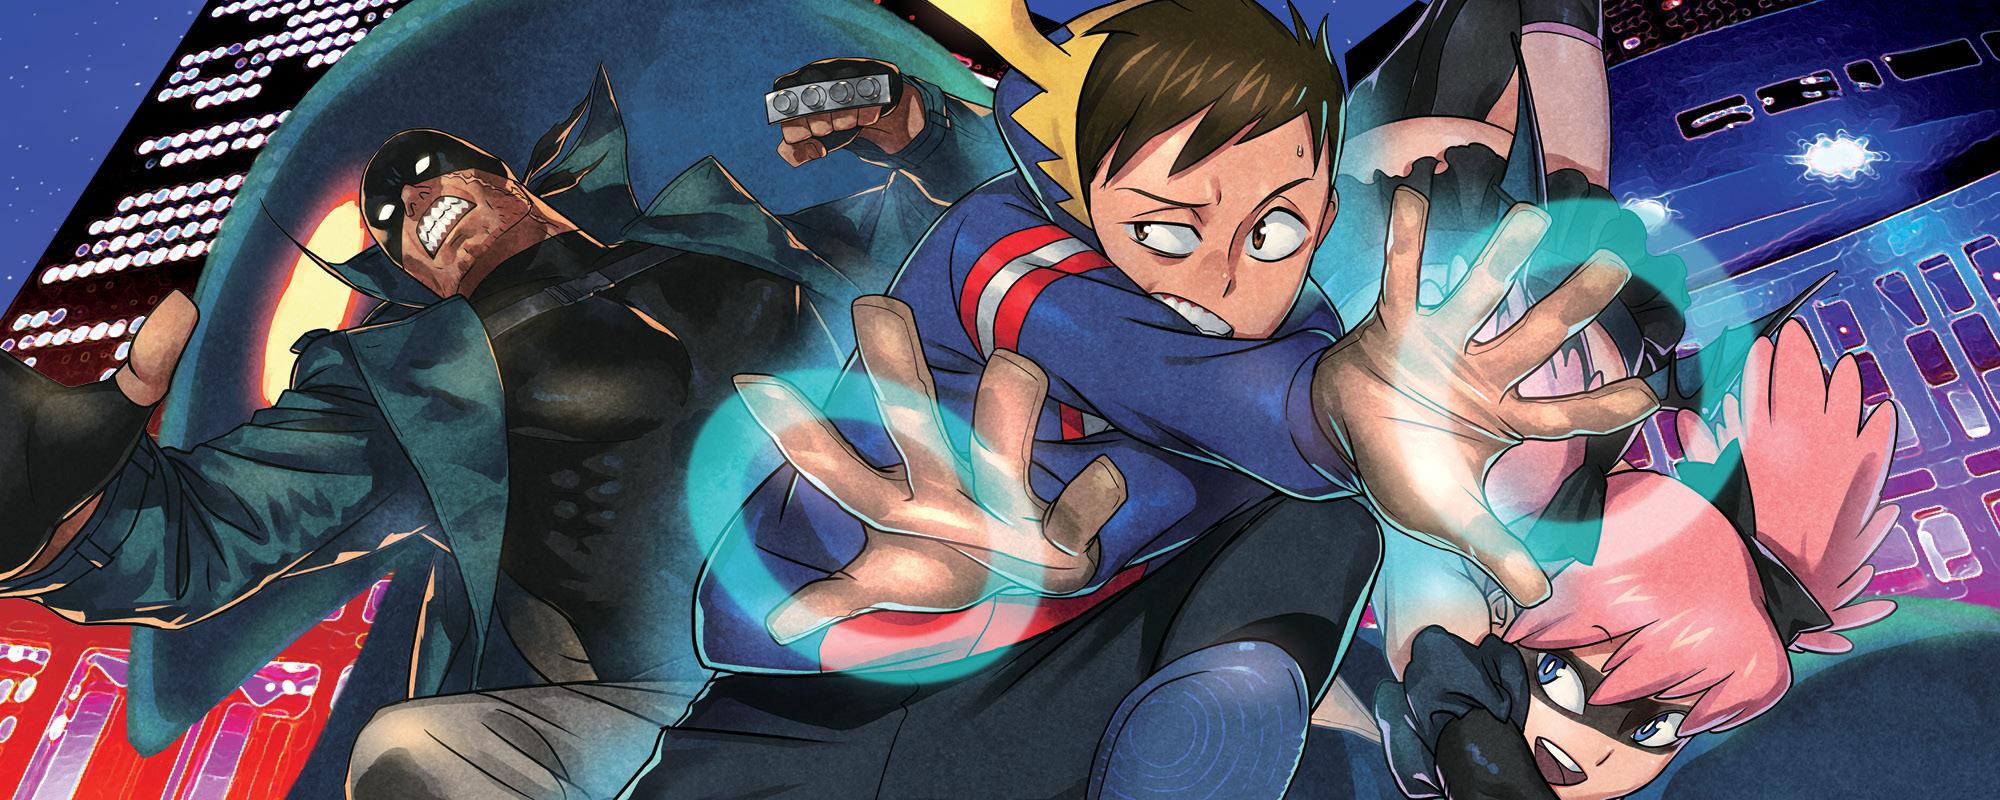 foto de VIZ | Read My Hero Academia: Vigilantes Manga Free - Official ...